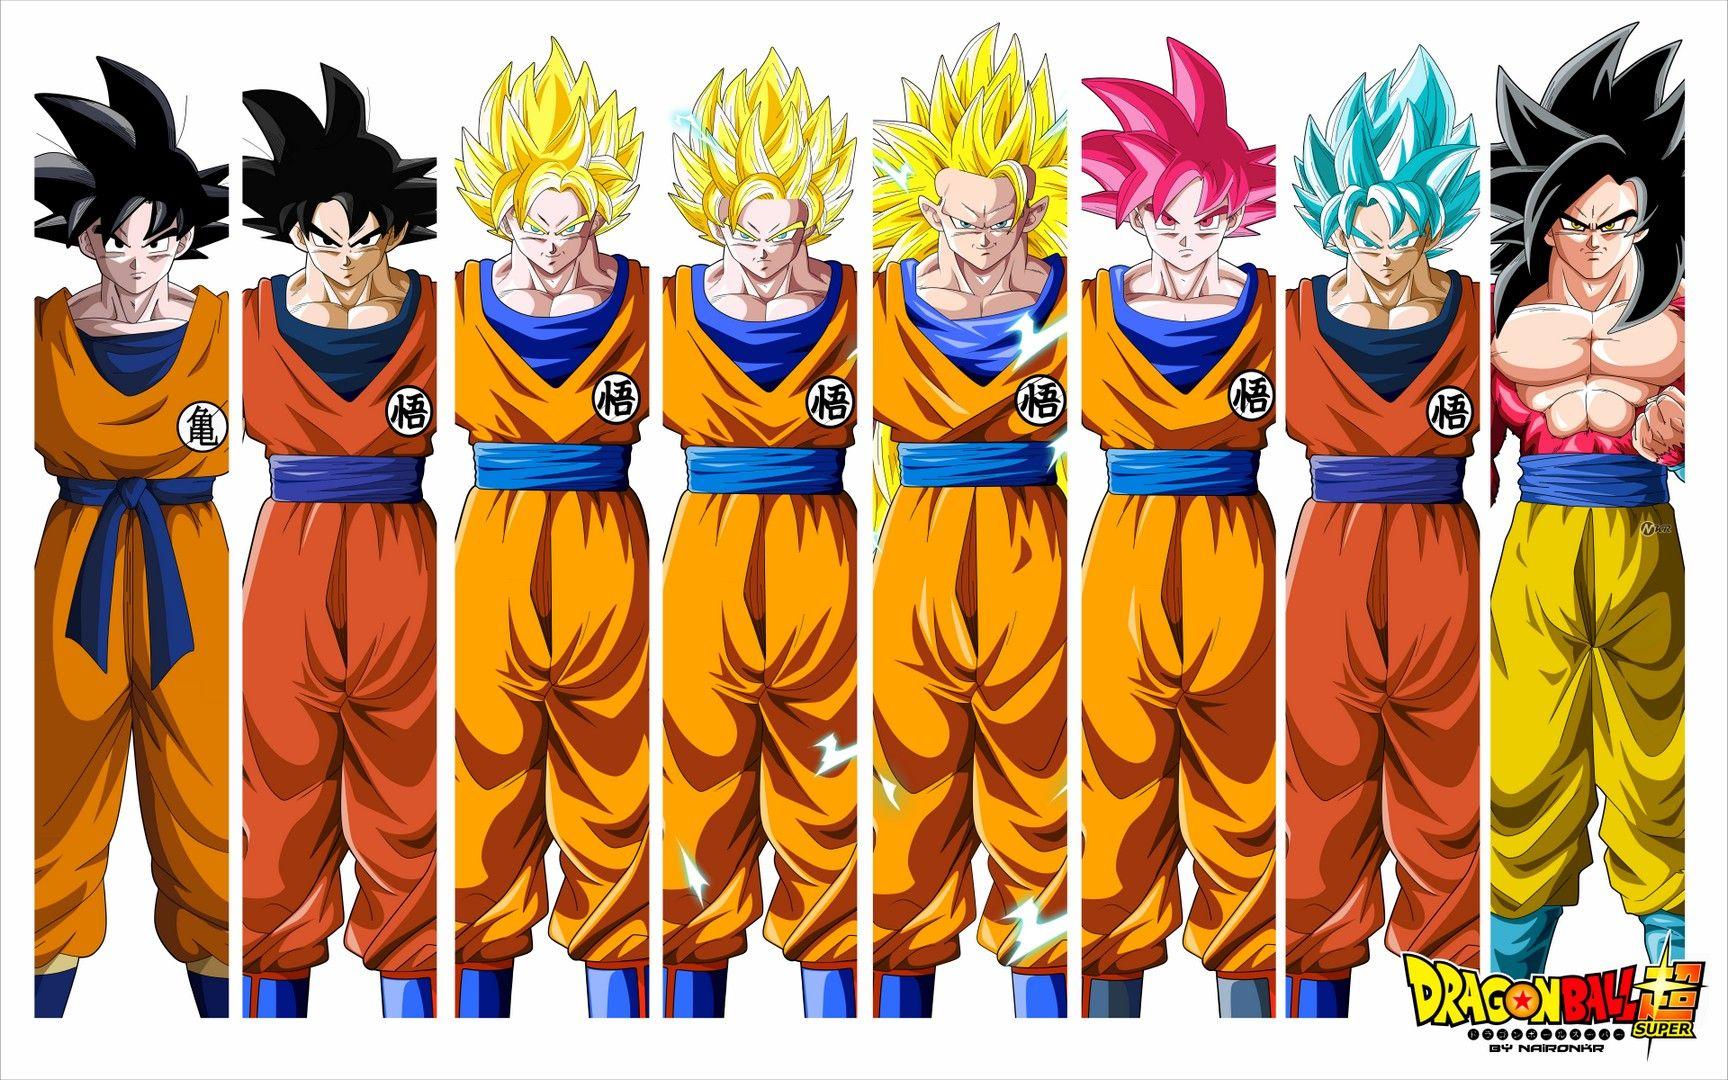 Goku All Form Wallpaper 2021 Live Wallpaper Hd Dragon Ball Super Wallpapers Dragon Ball Super Goku Goku All Forms